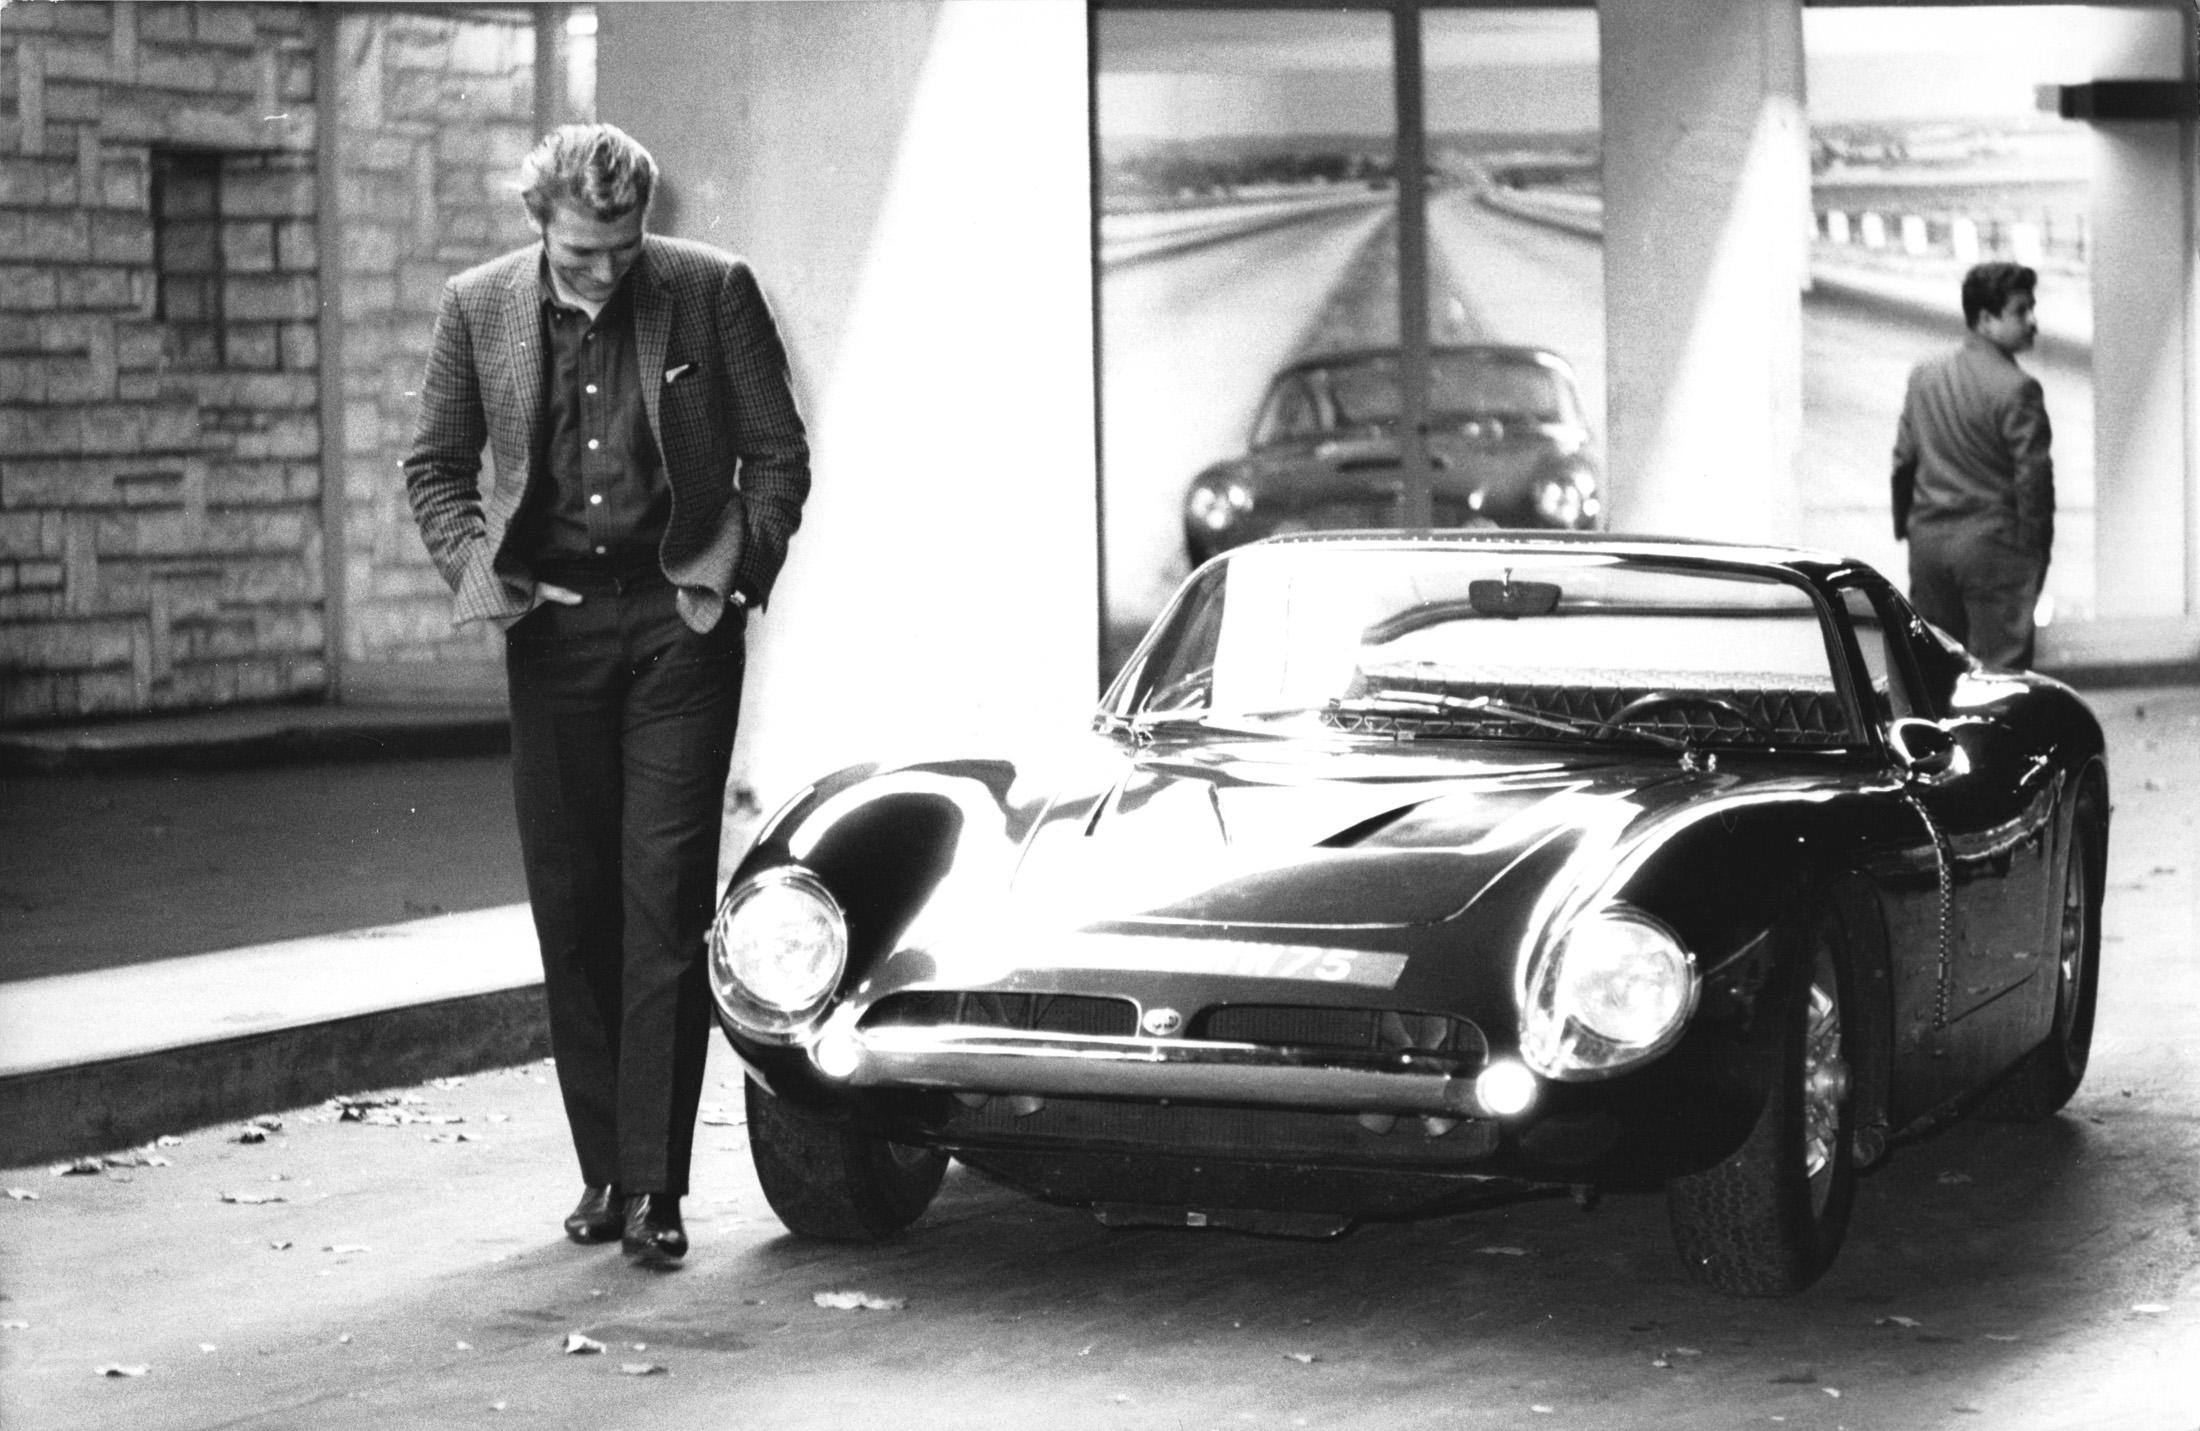 Beyond Ferrari Vintage Bizzarrini Gt 5300 1900 Europa P538s Bloomberg